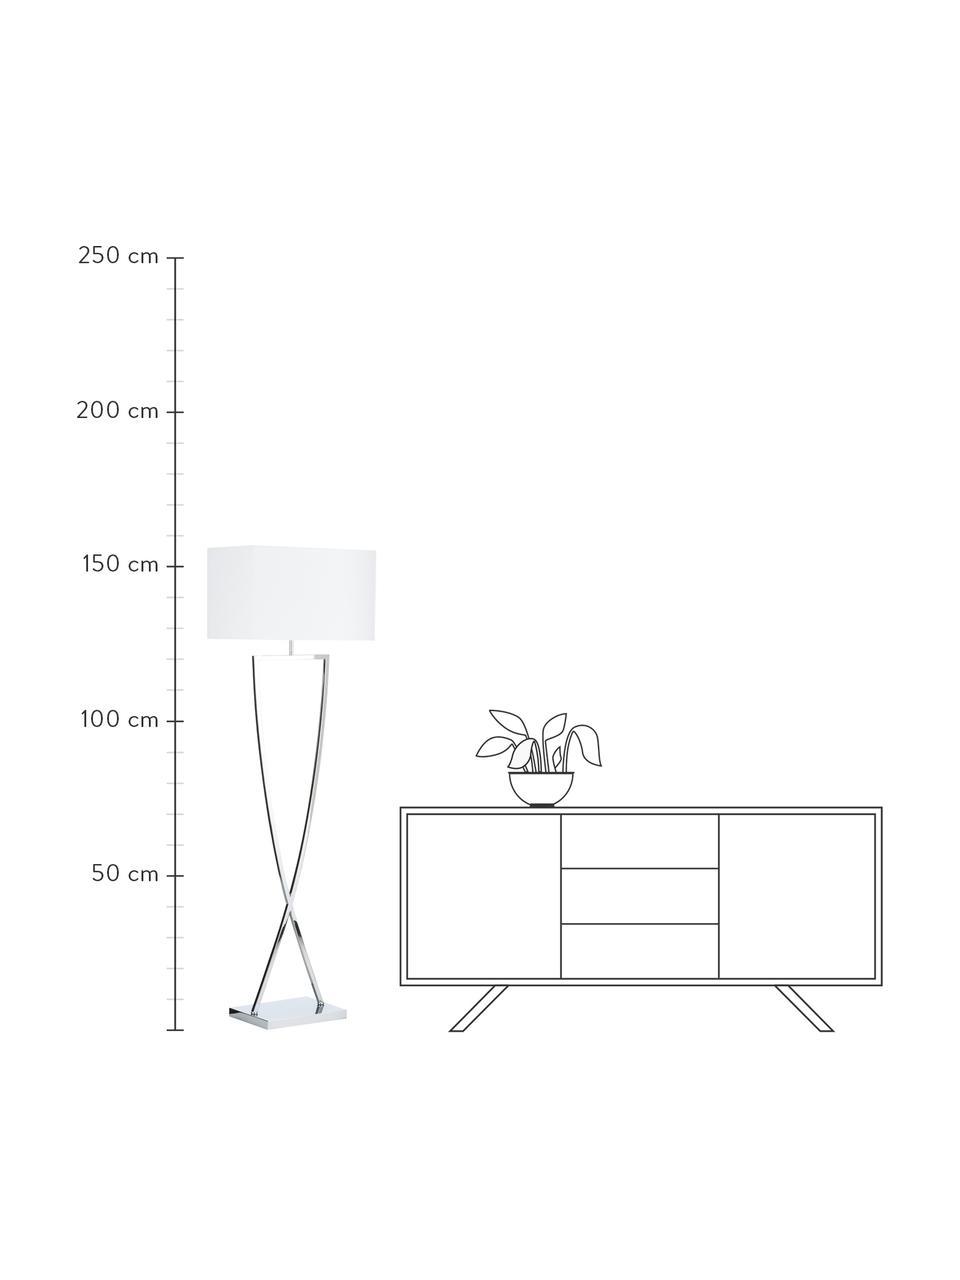 Stehlampe Toulouse in Silber, Lampenschirm: Textil, Lampenfuß: Metall, verchromt, Chrom, Weiß, 50 x 157 cm